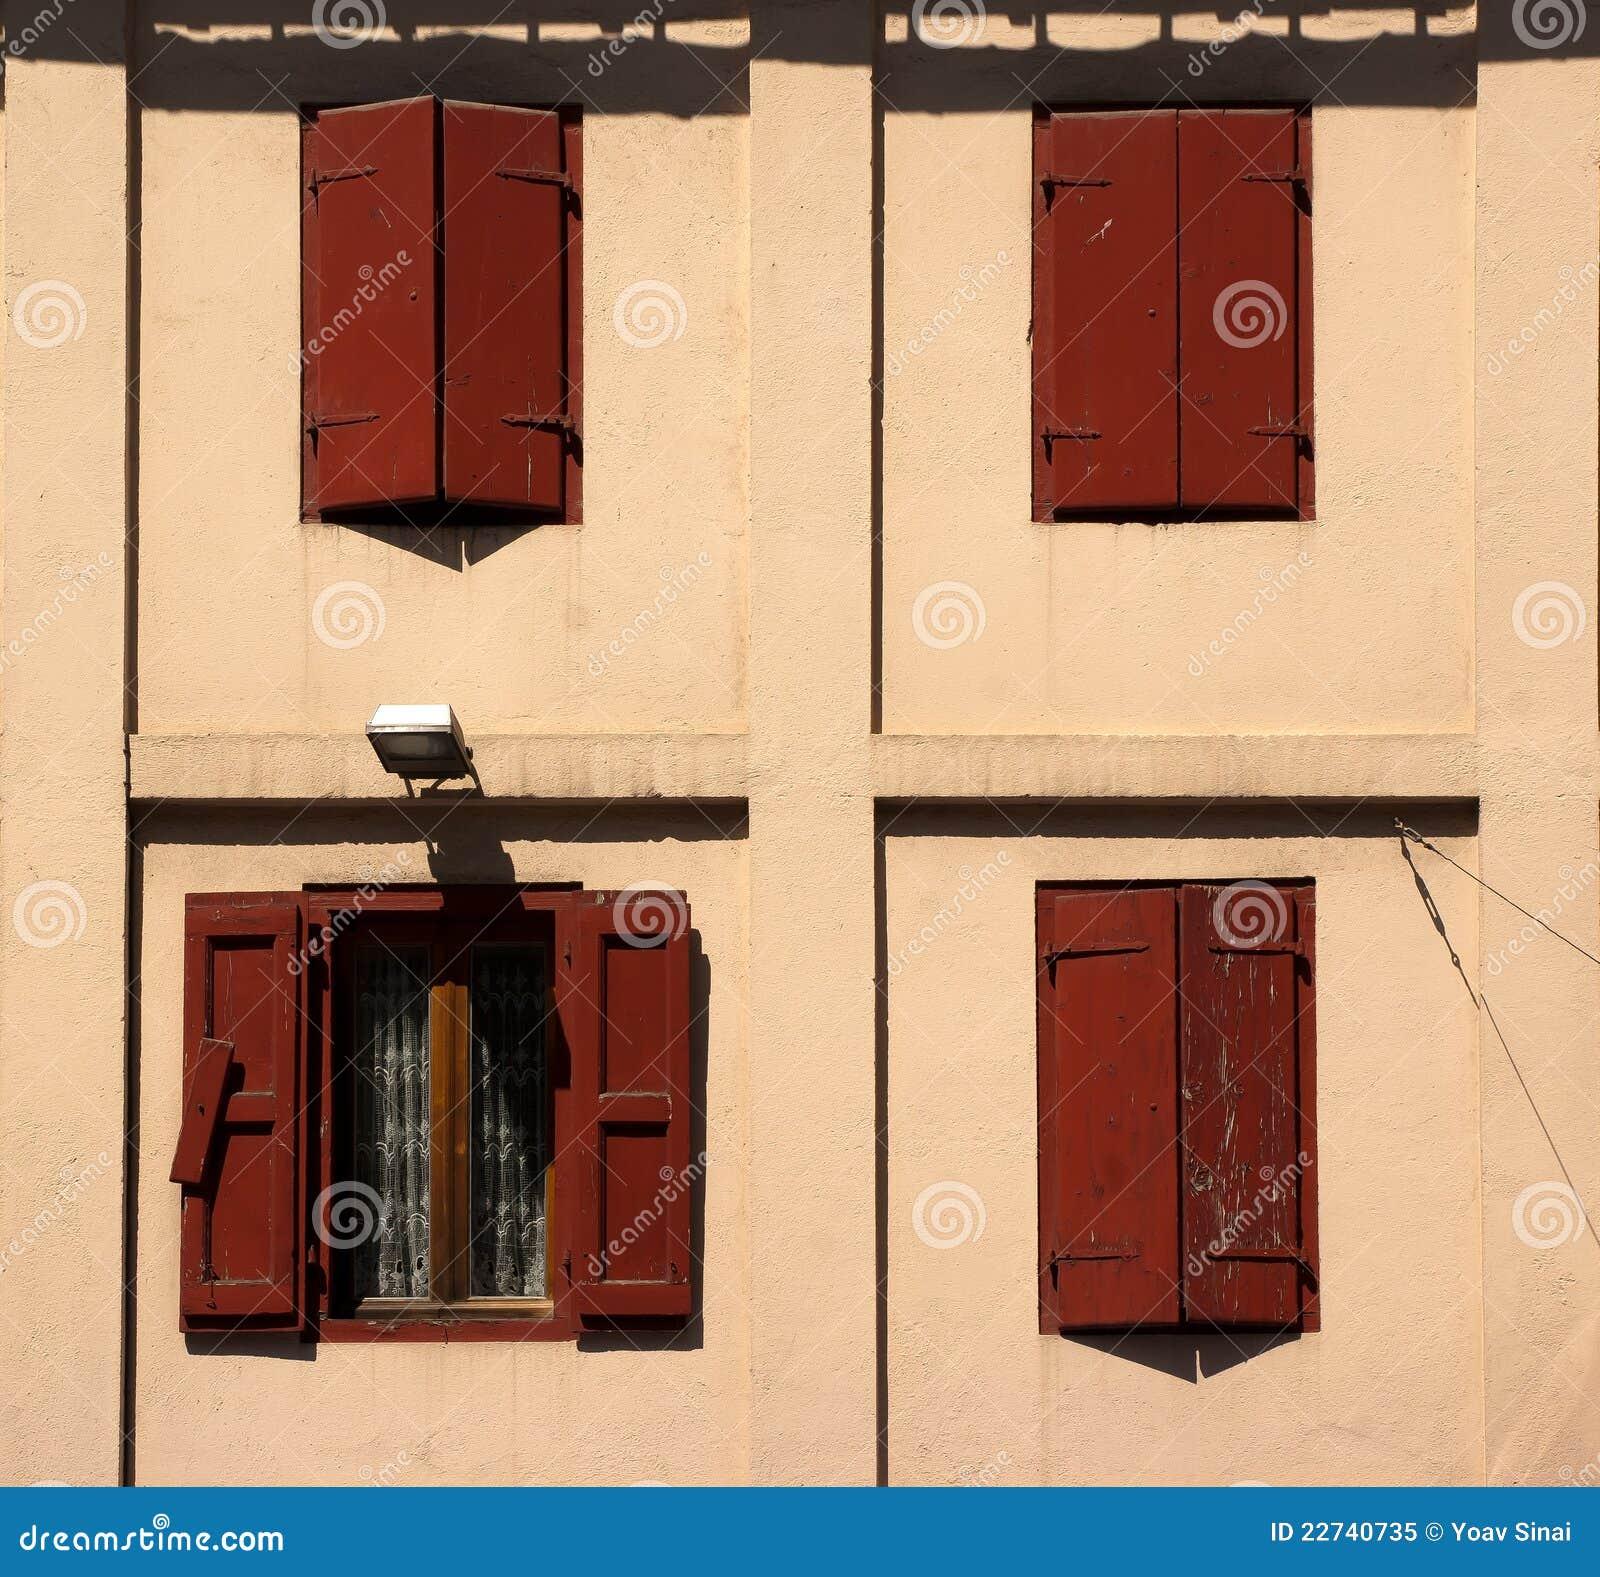 how to keep window shutters open